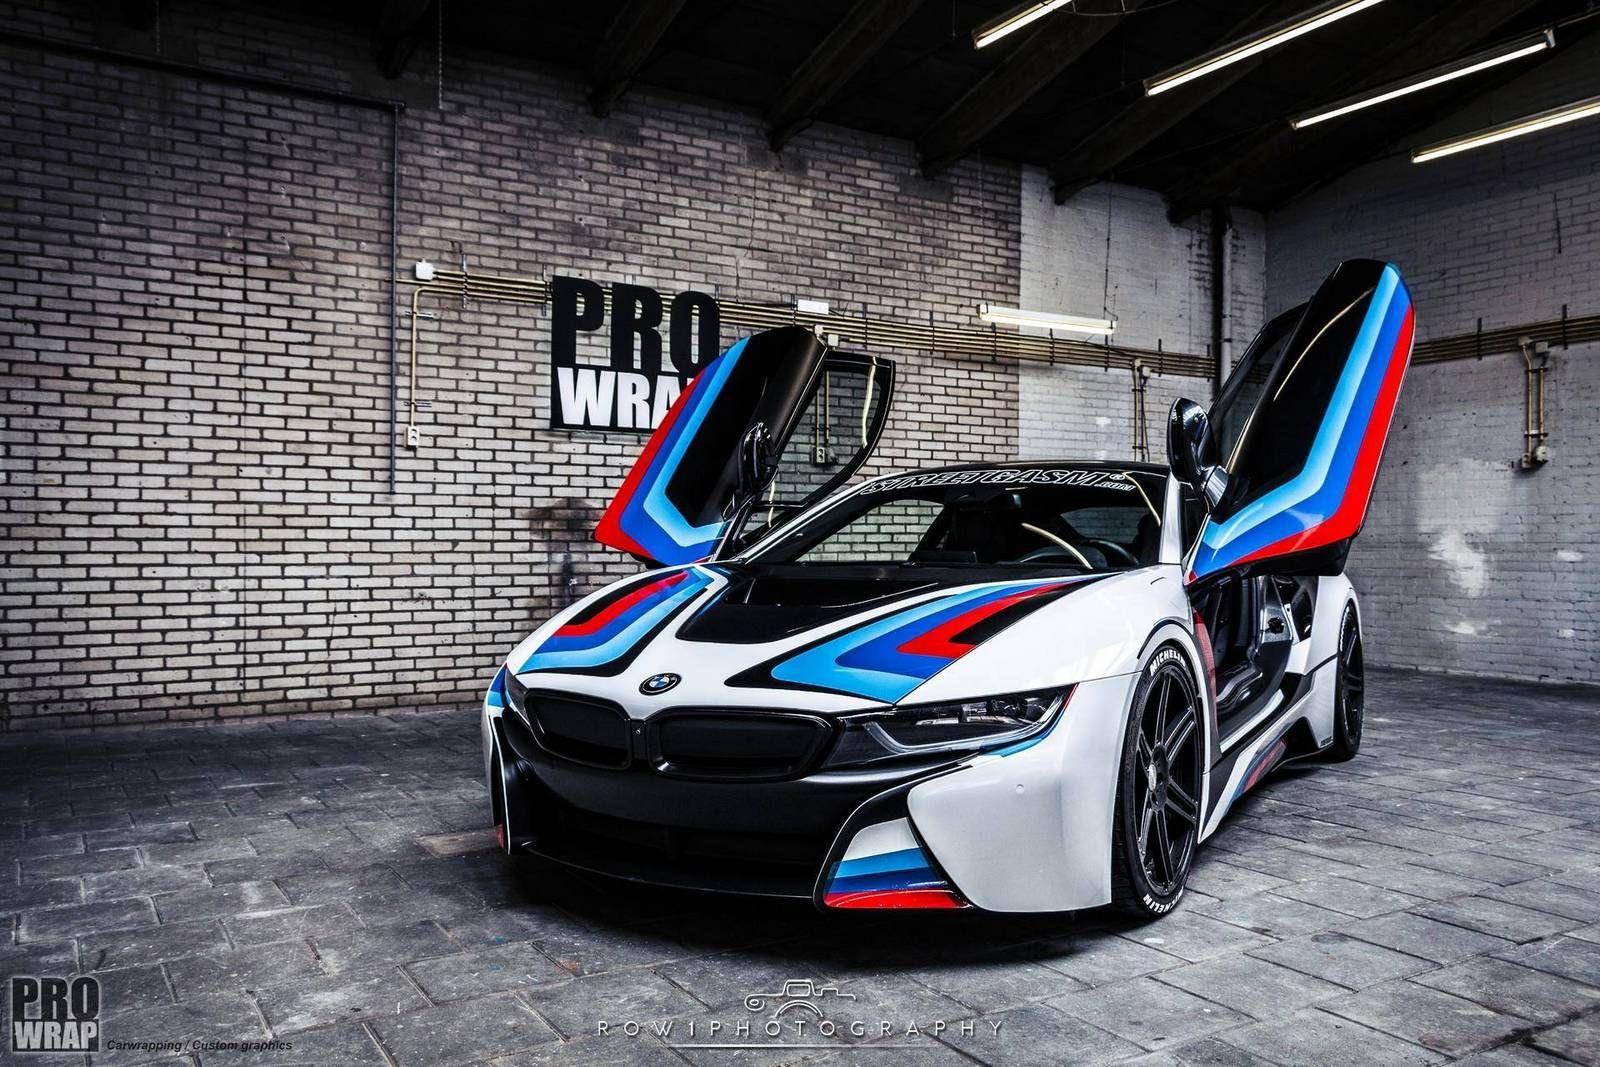 Worksheet. Custom Wrapped BMW i8 by Prowrap in The Netherlands  Custom wraps